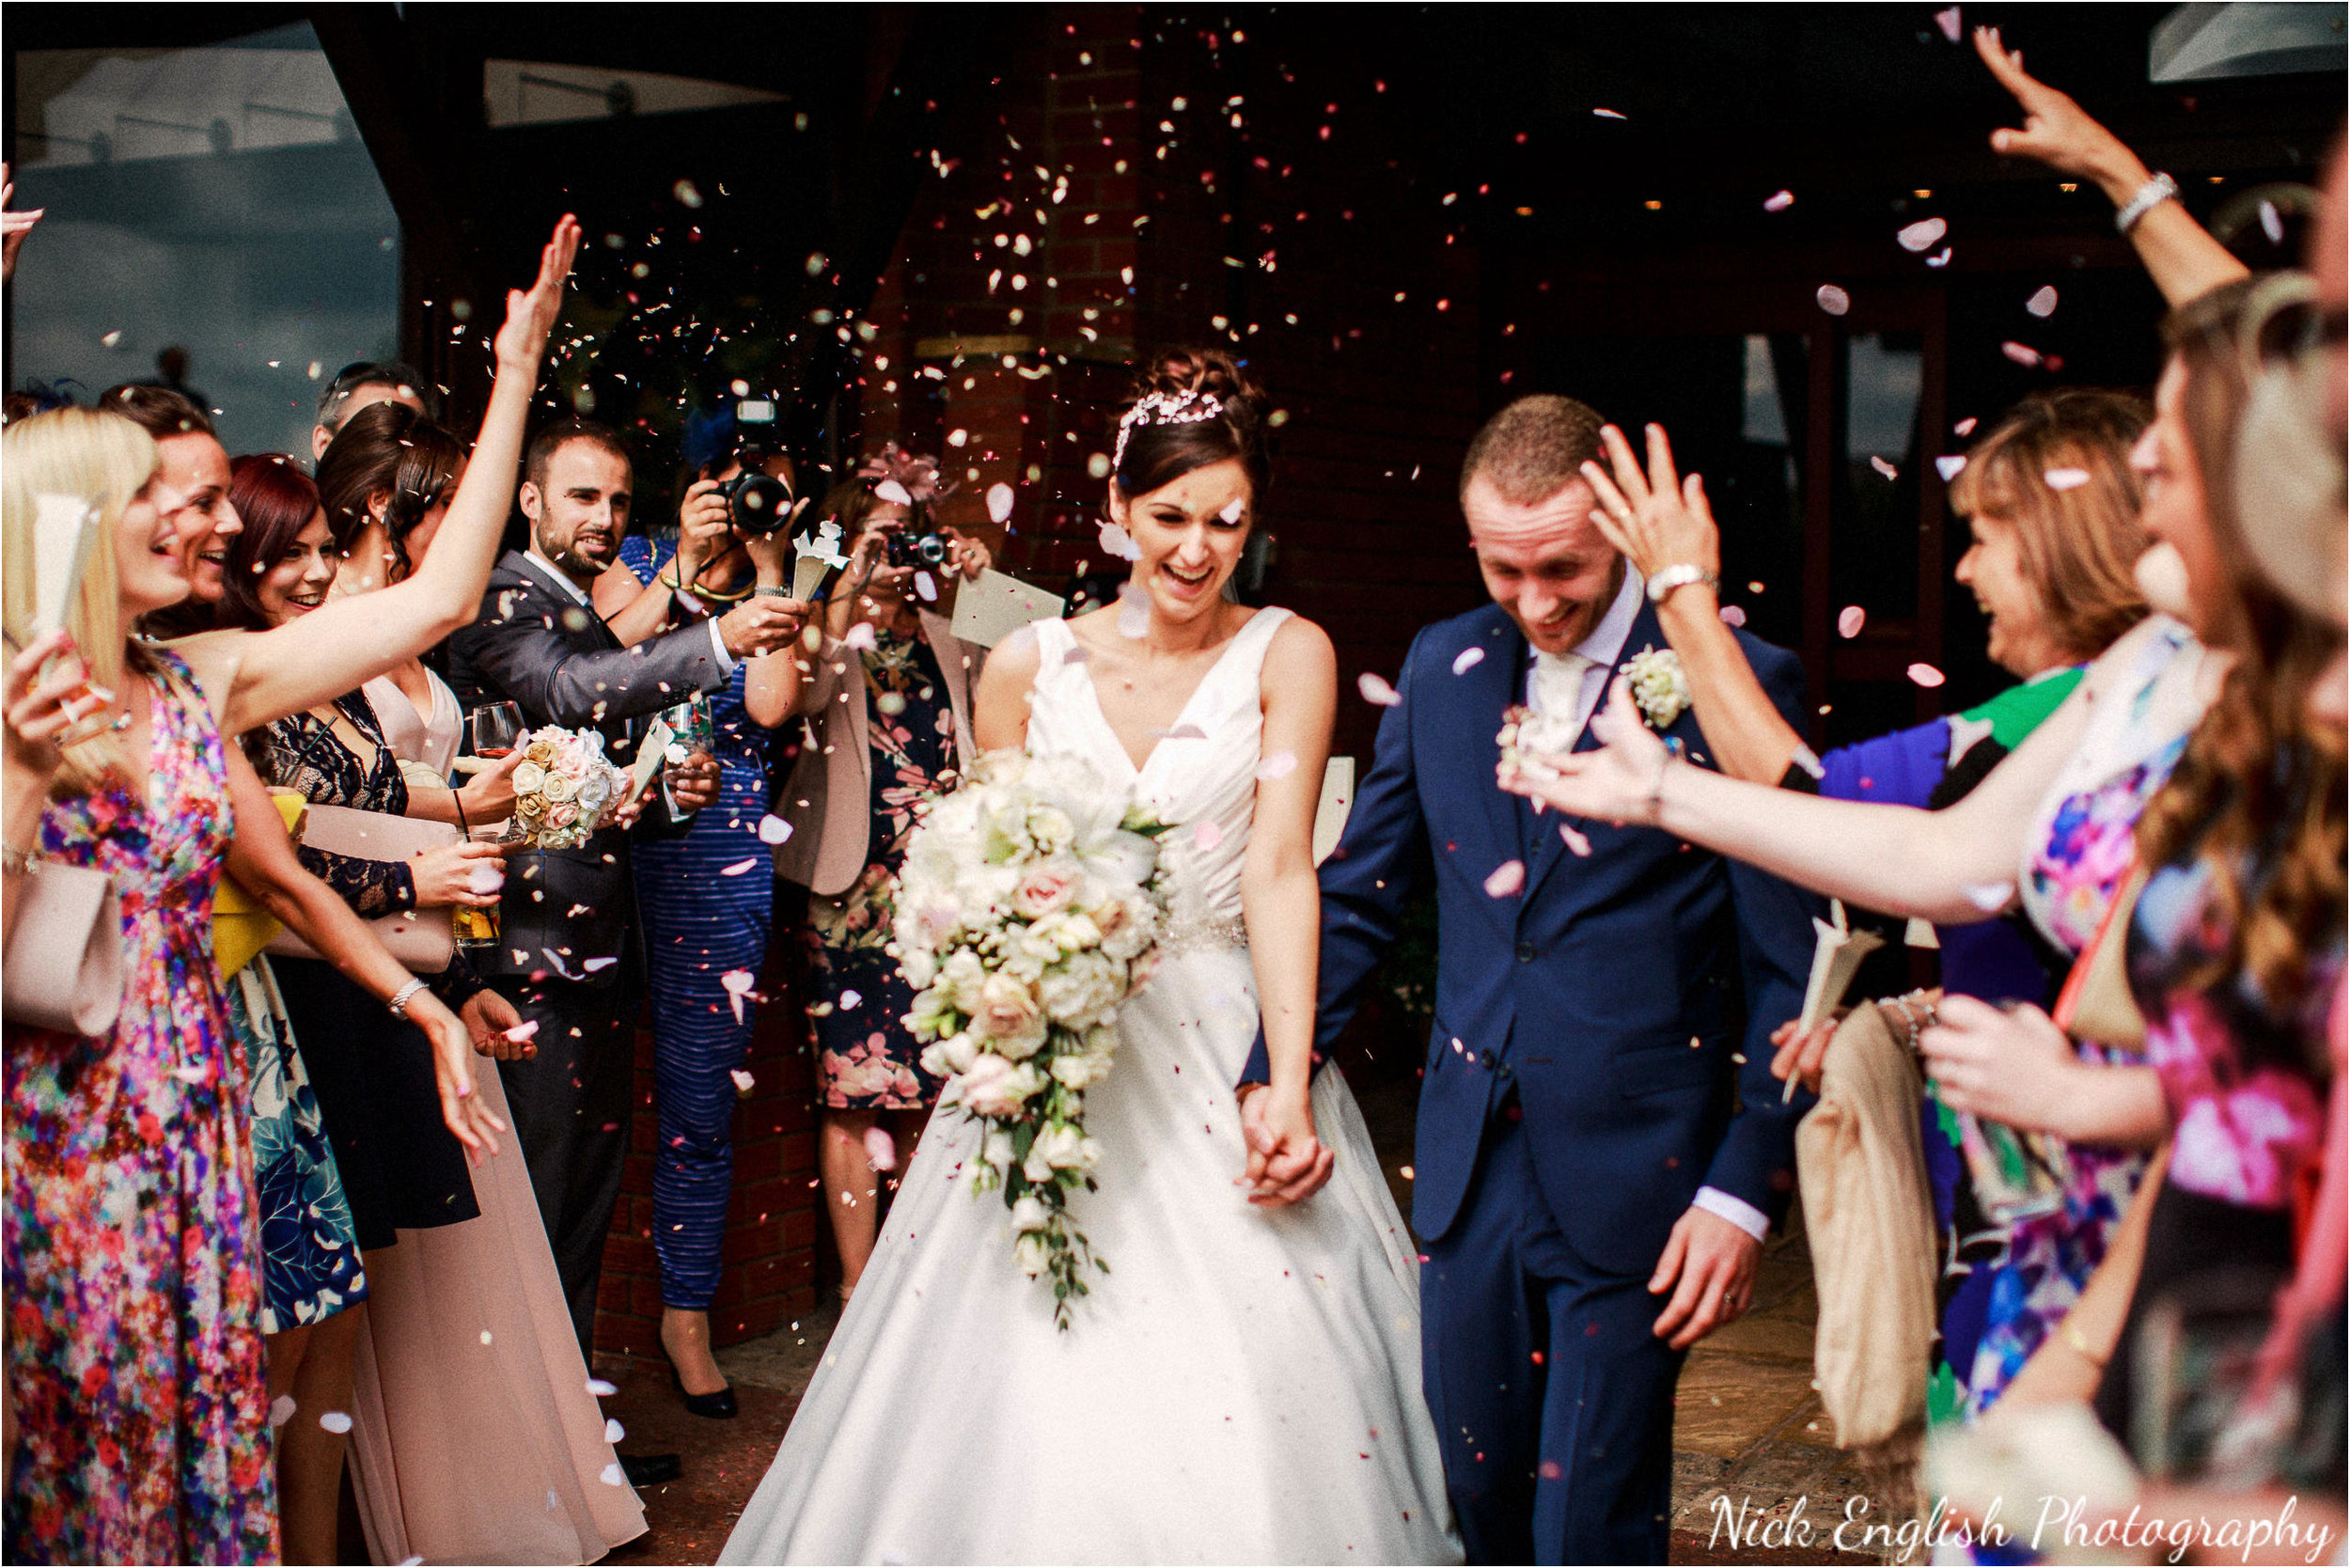 Emily David Wedding Photographs at Barton Grange Preston by Nick English Photography 151jpg.jpeg